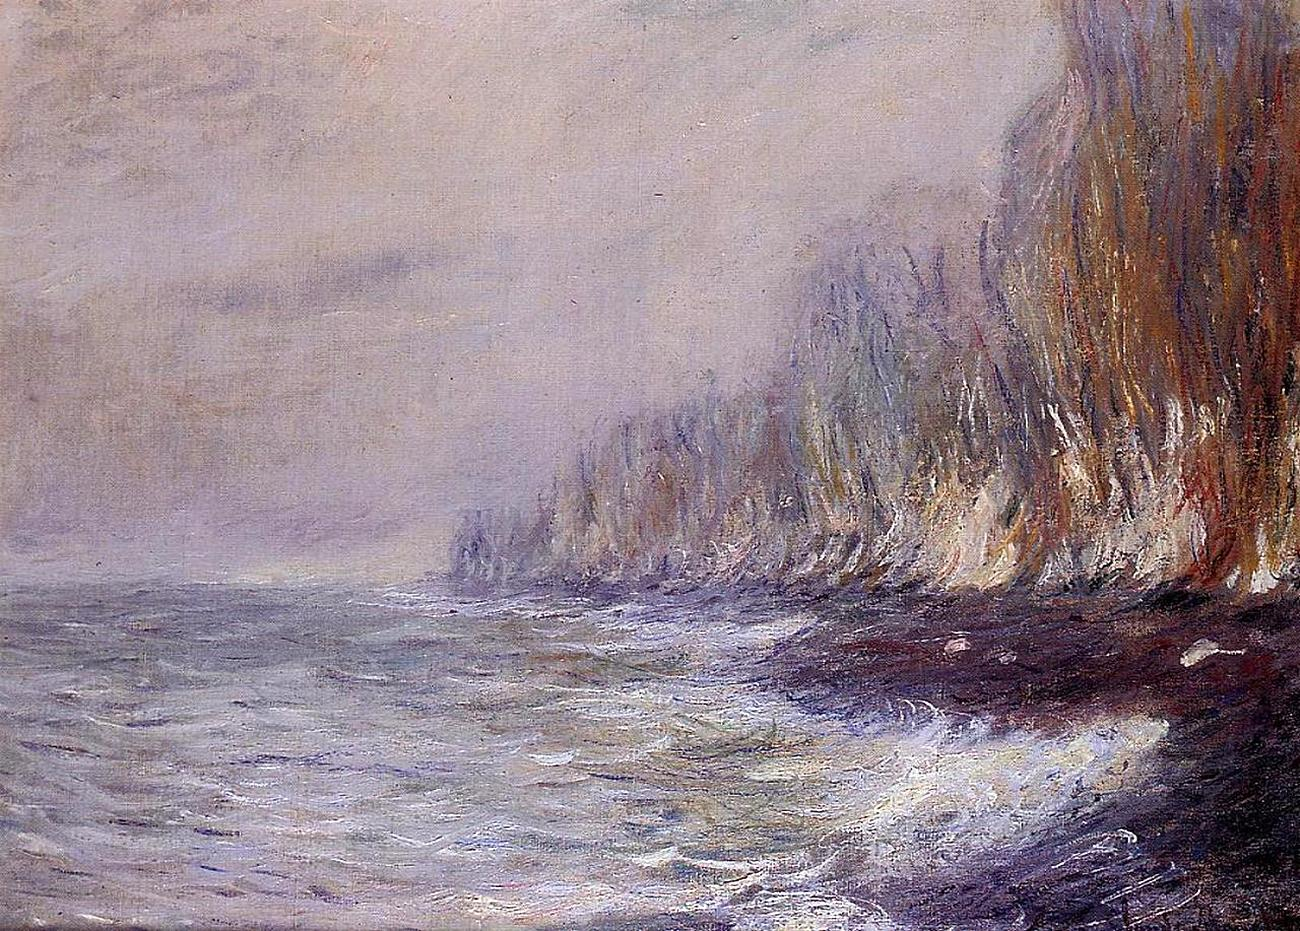 ������� - ��������� < ����� ���� ����� >:: ���� ����, �������� ������� - ���� ���� (Claude Monet) ����